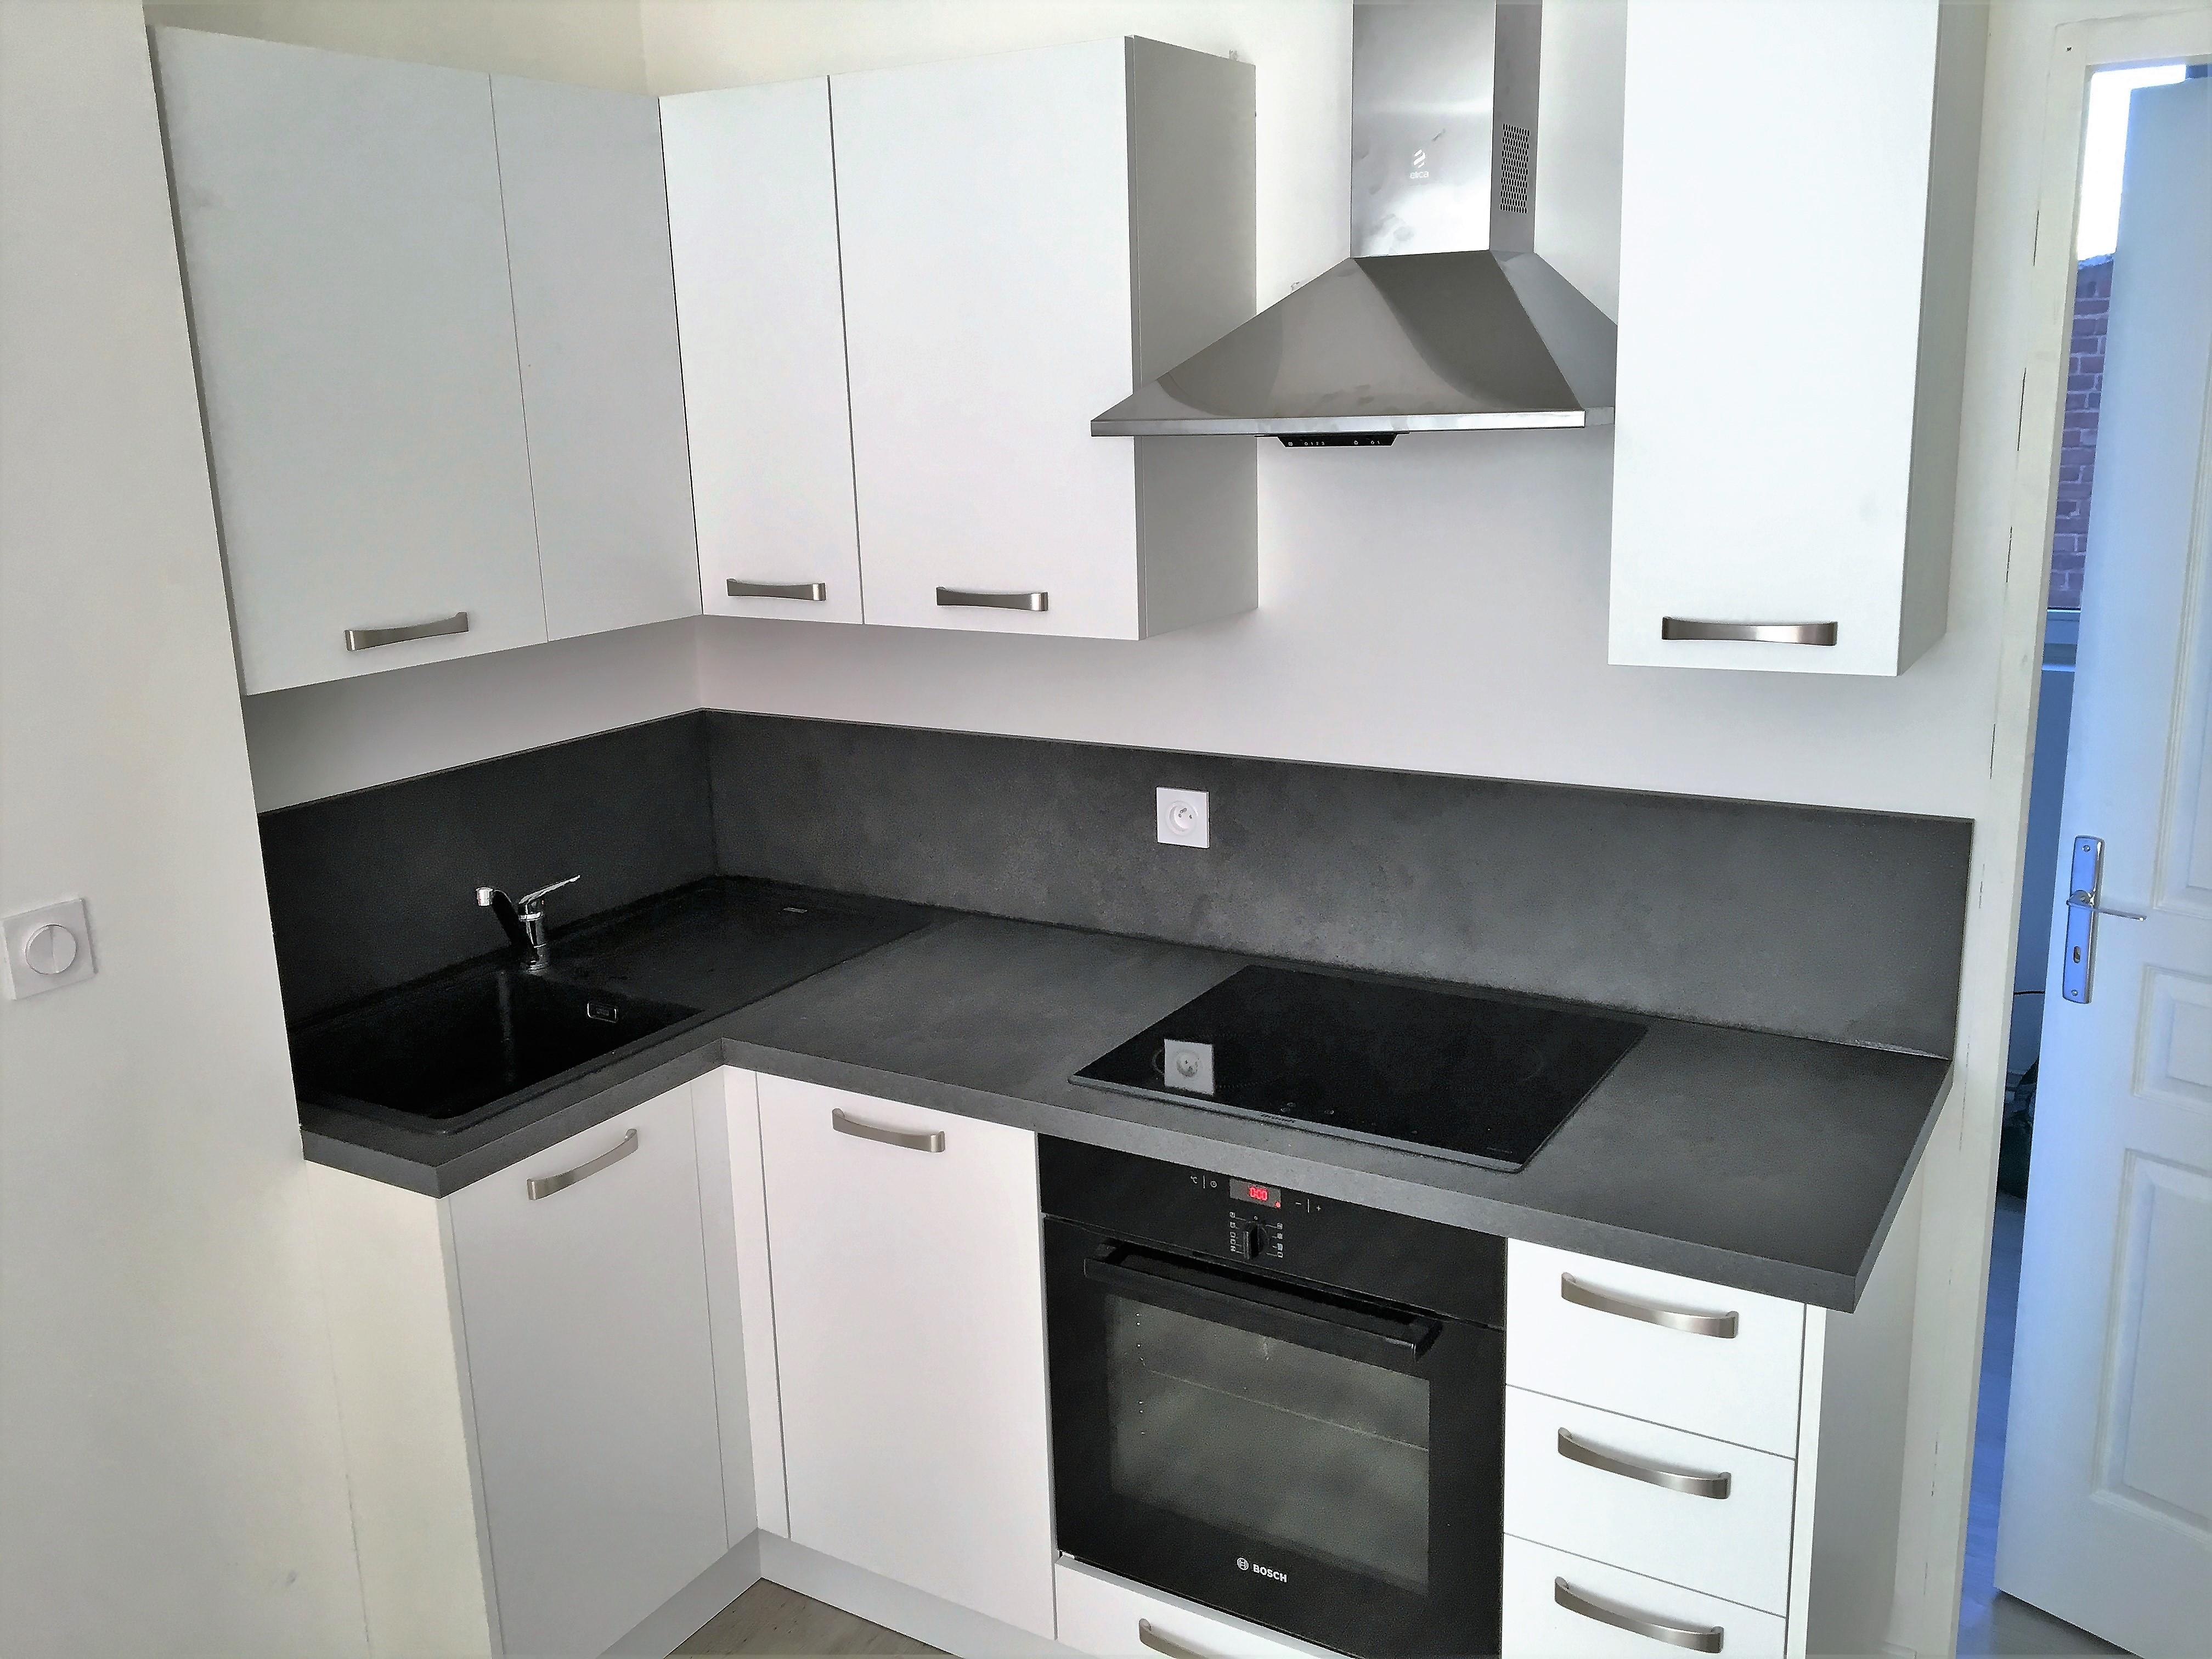 kitchenette arras kubbe cuisine arras. Black Bedroom Furniture Sets. Home Design Ideas